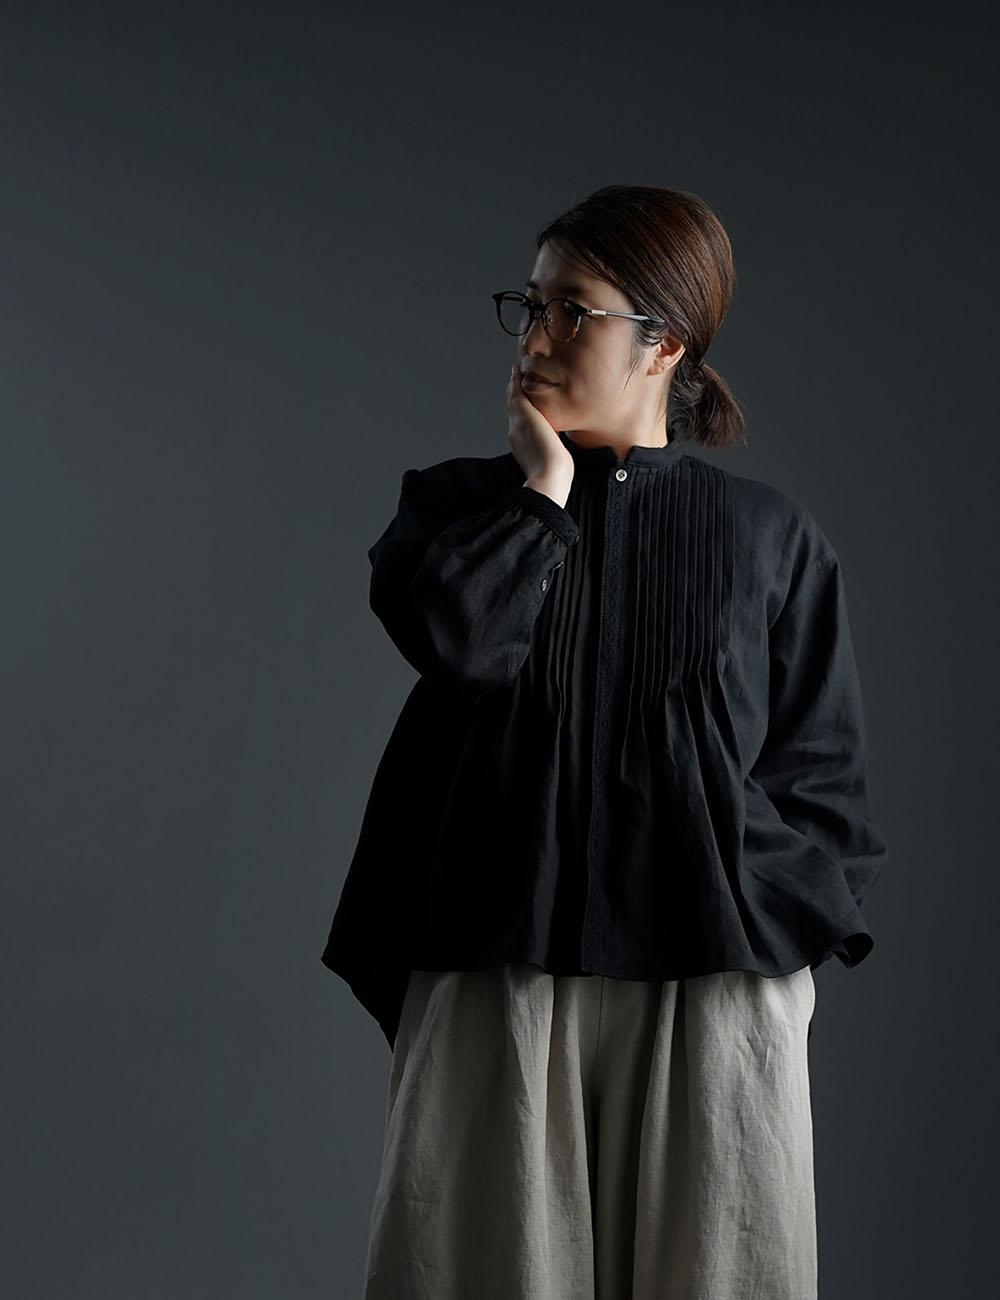 【wafu】Rosanna(ロザンナ) Pintucked linen shirt /2色展開 t006d